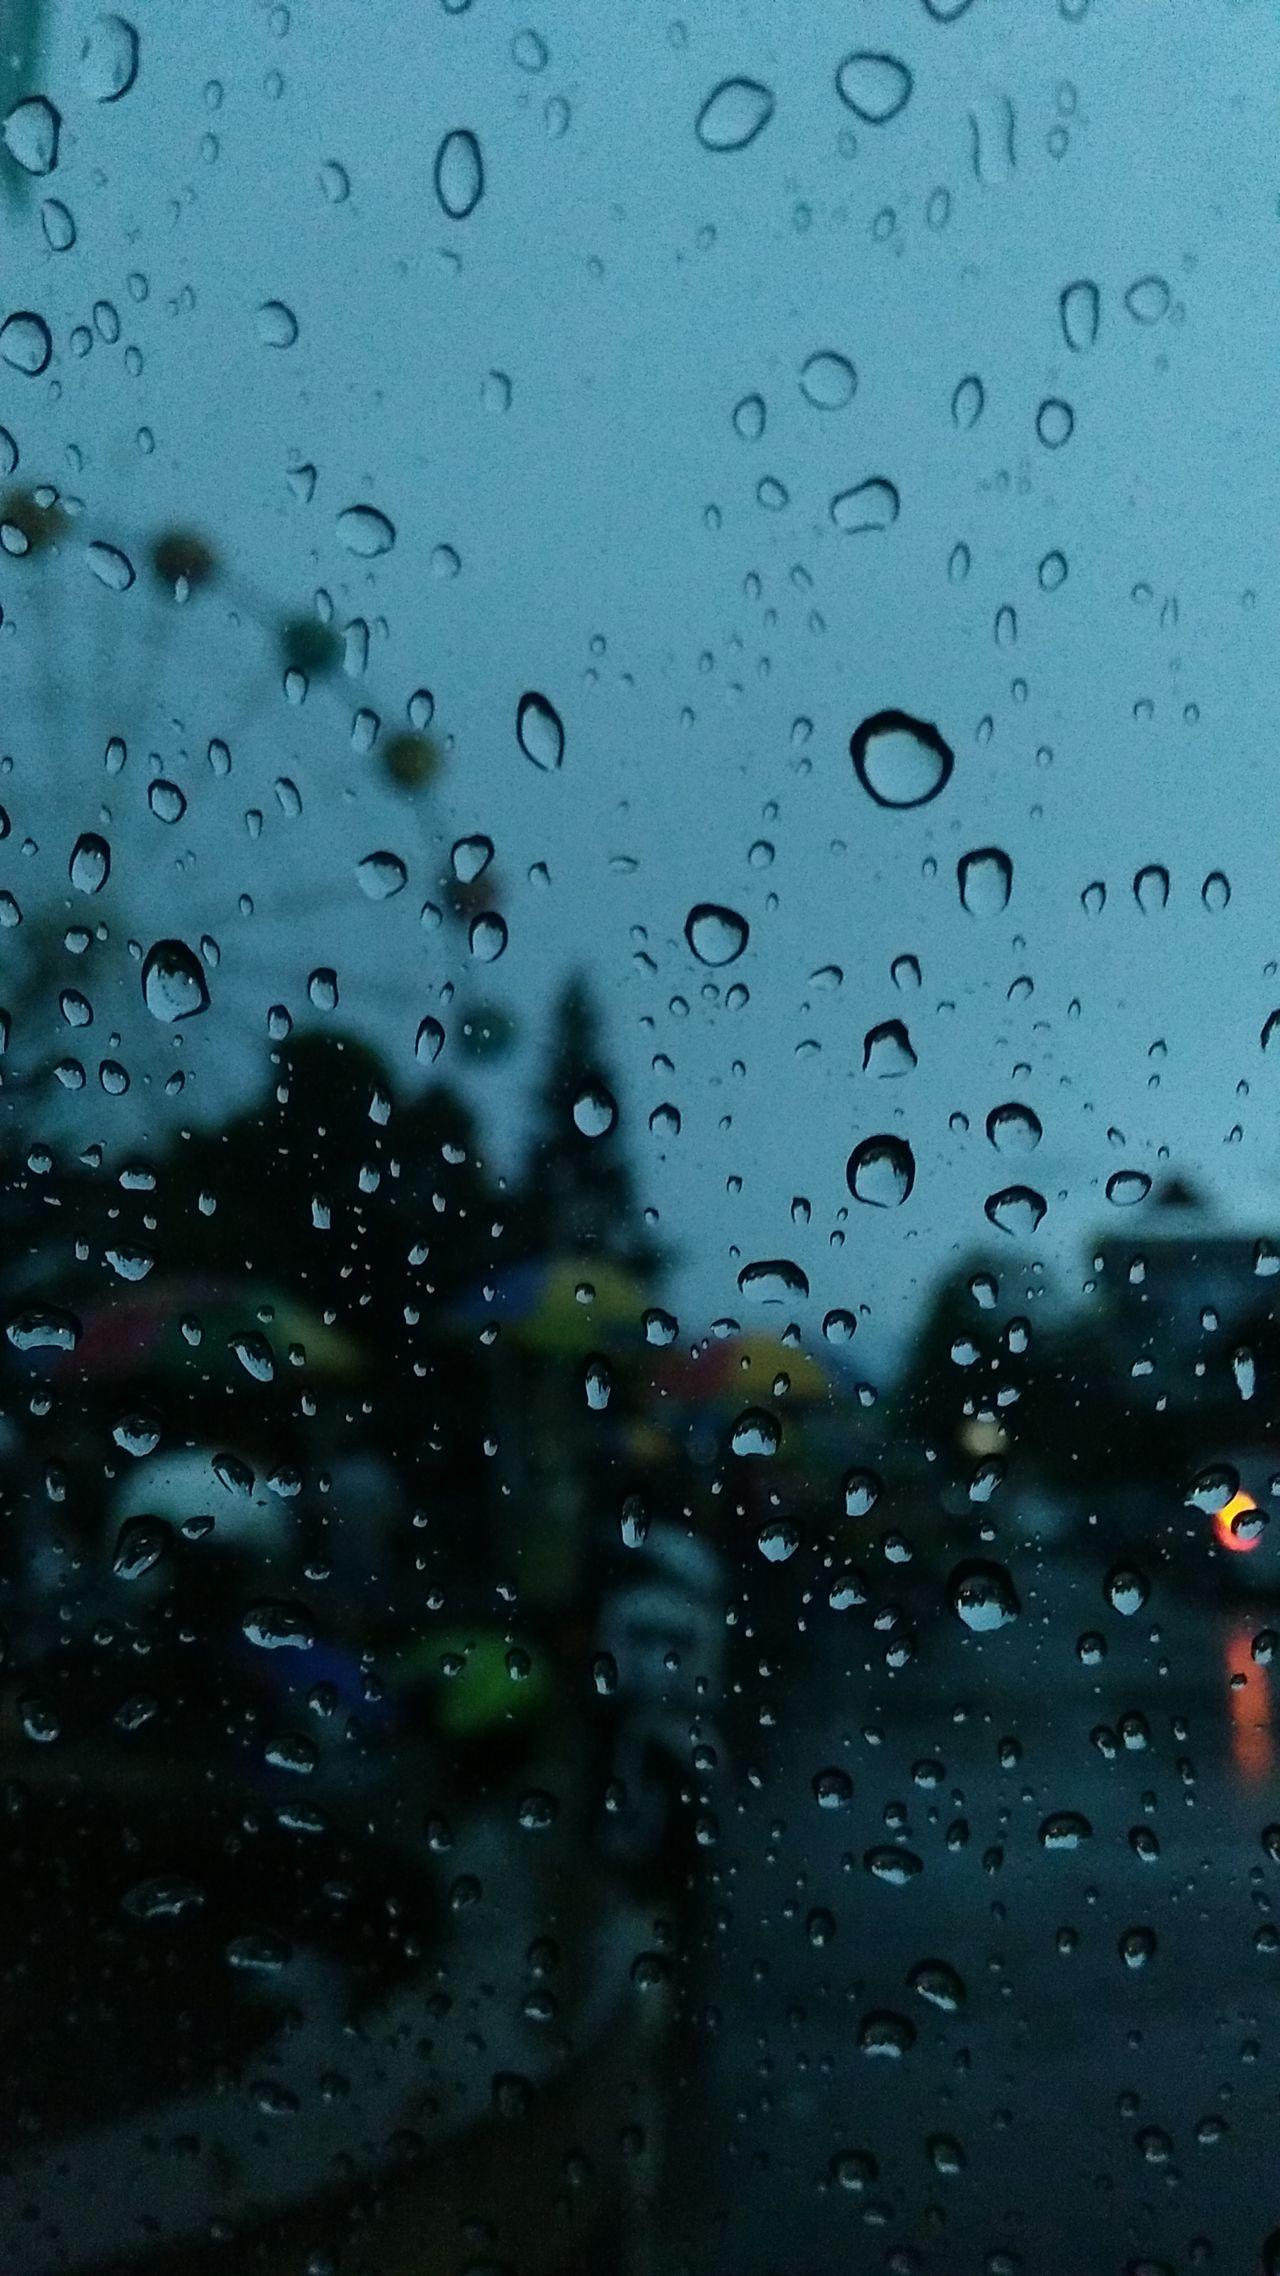 Waiting inside Rain Raindrops Water Glass Window View Ferris Wheel Motorcycle Light And Shadow Dark